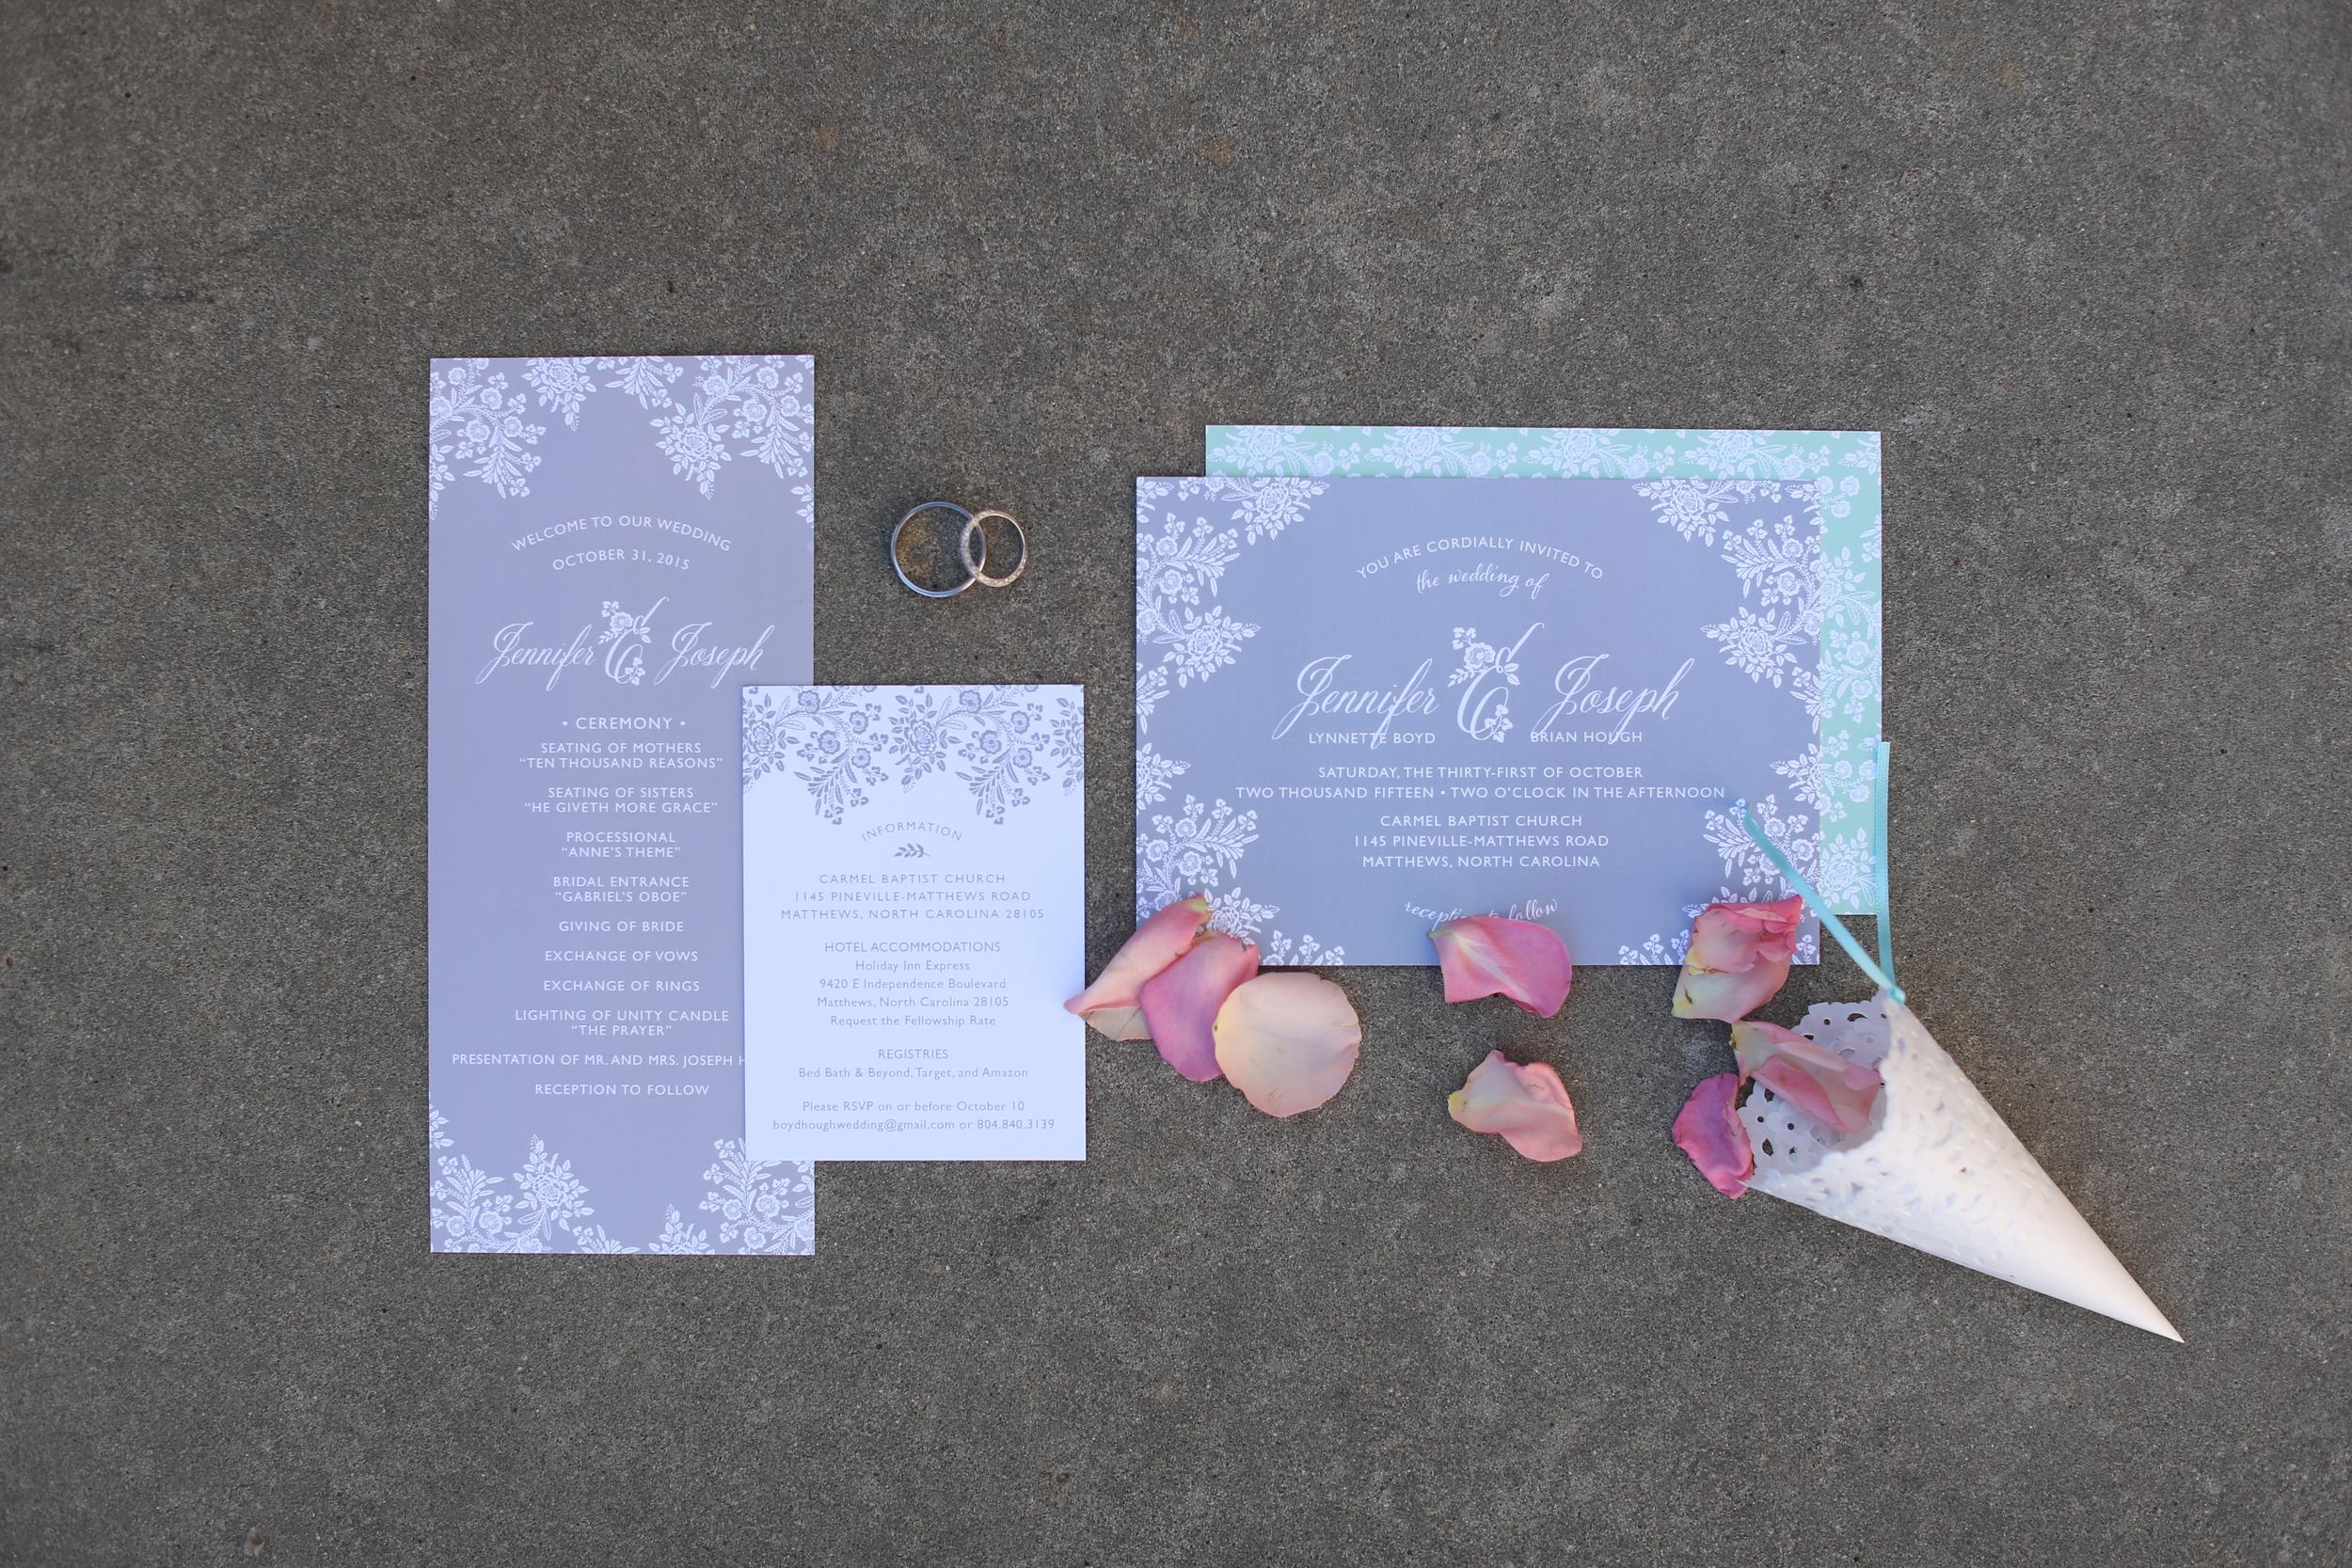 Hough_Wedding_North_Carolina_Charlotte_JonCourvillePhotography-15.jpg